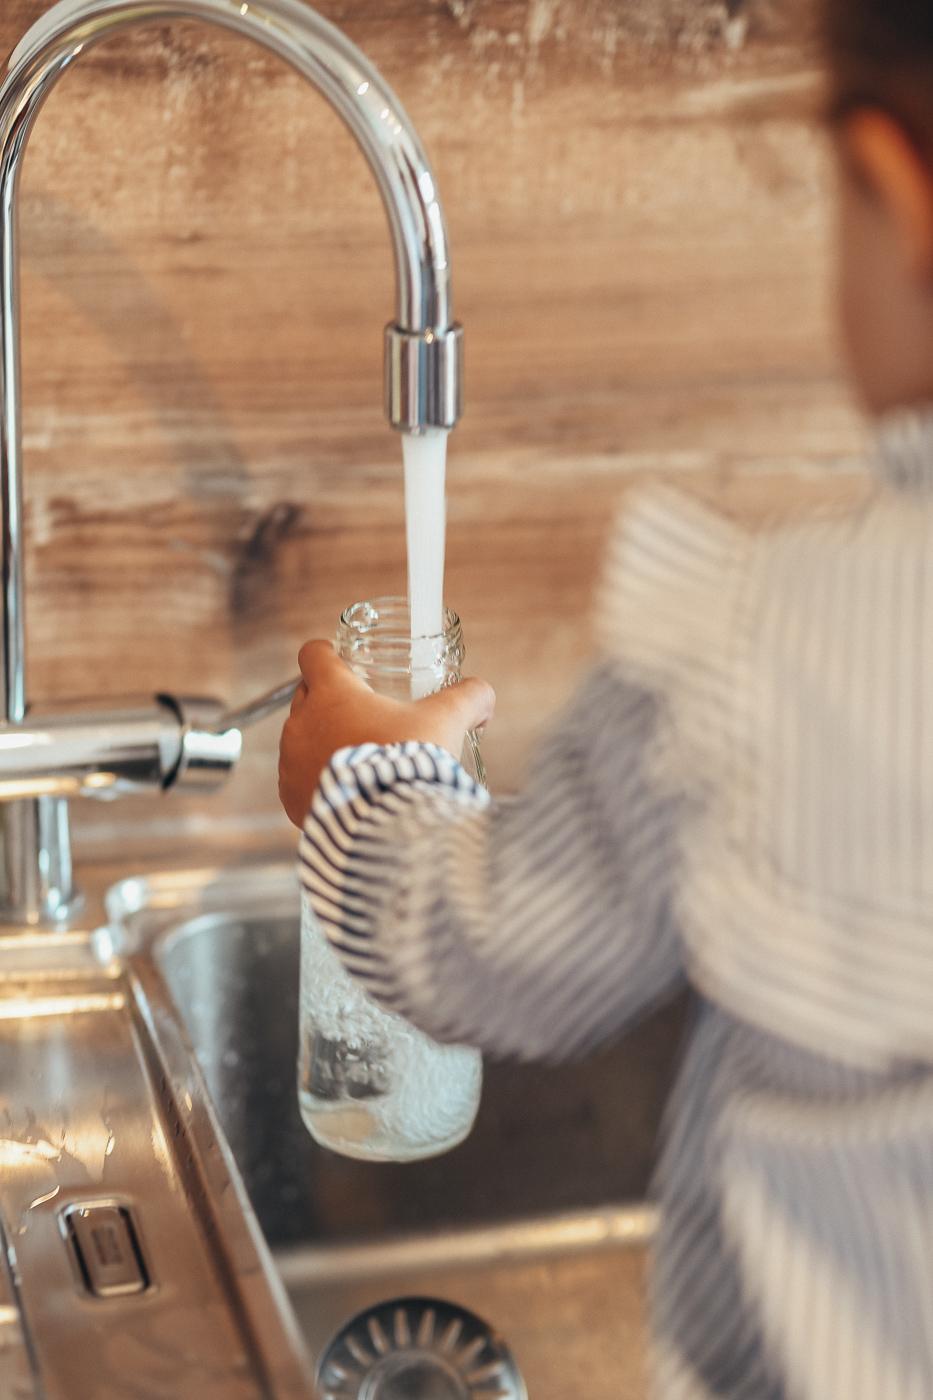 Läuft bei uns - fabelhaftes Leitungswasser | München